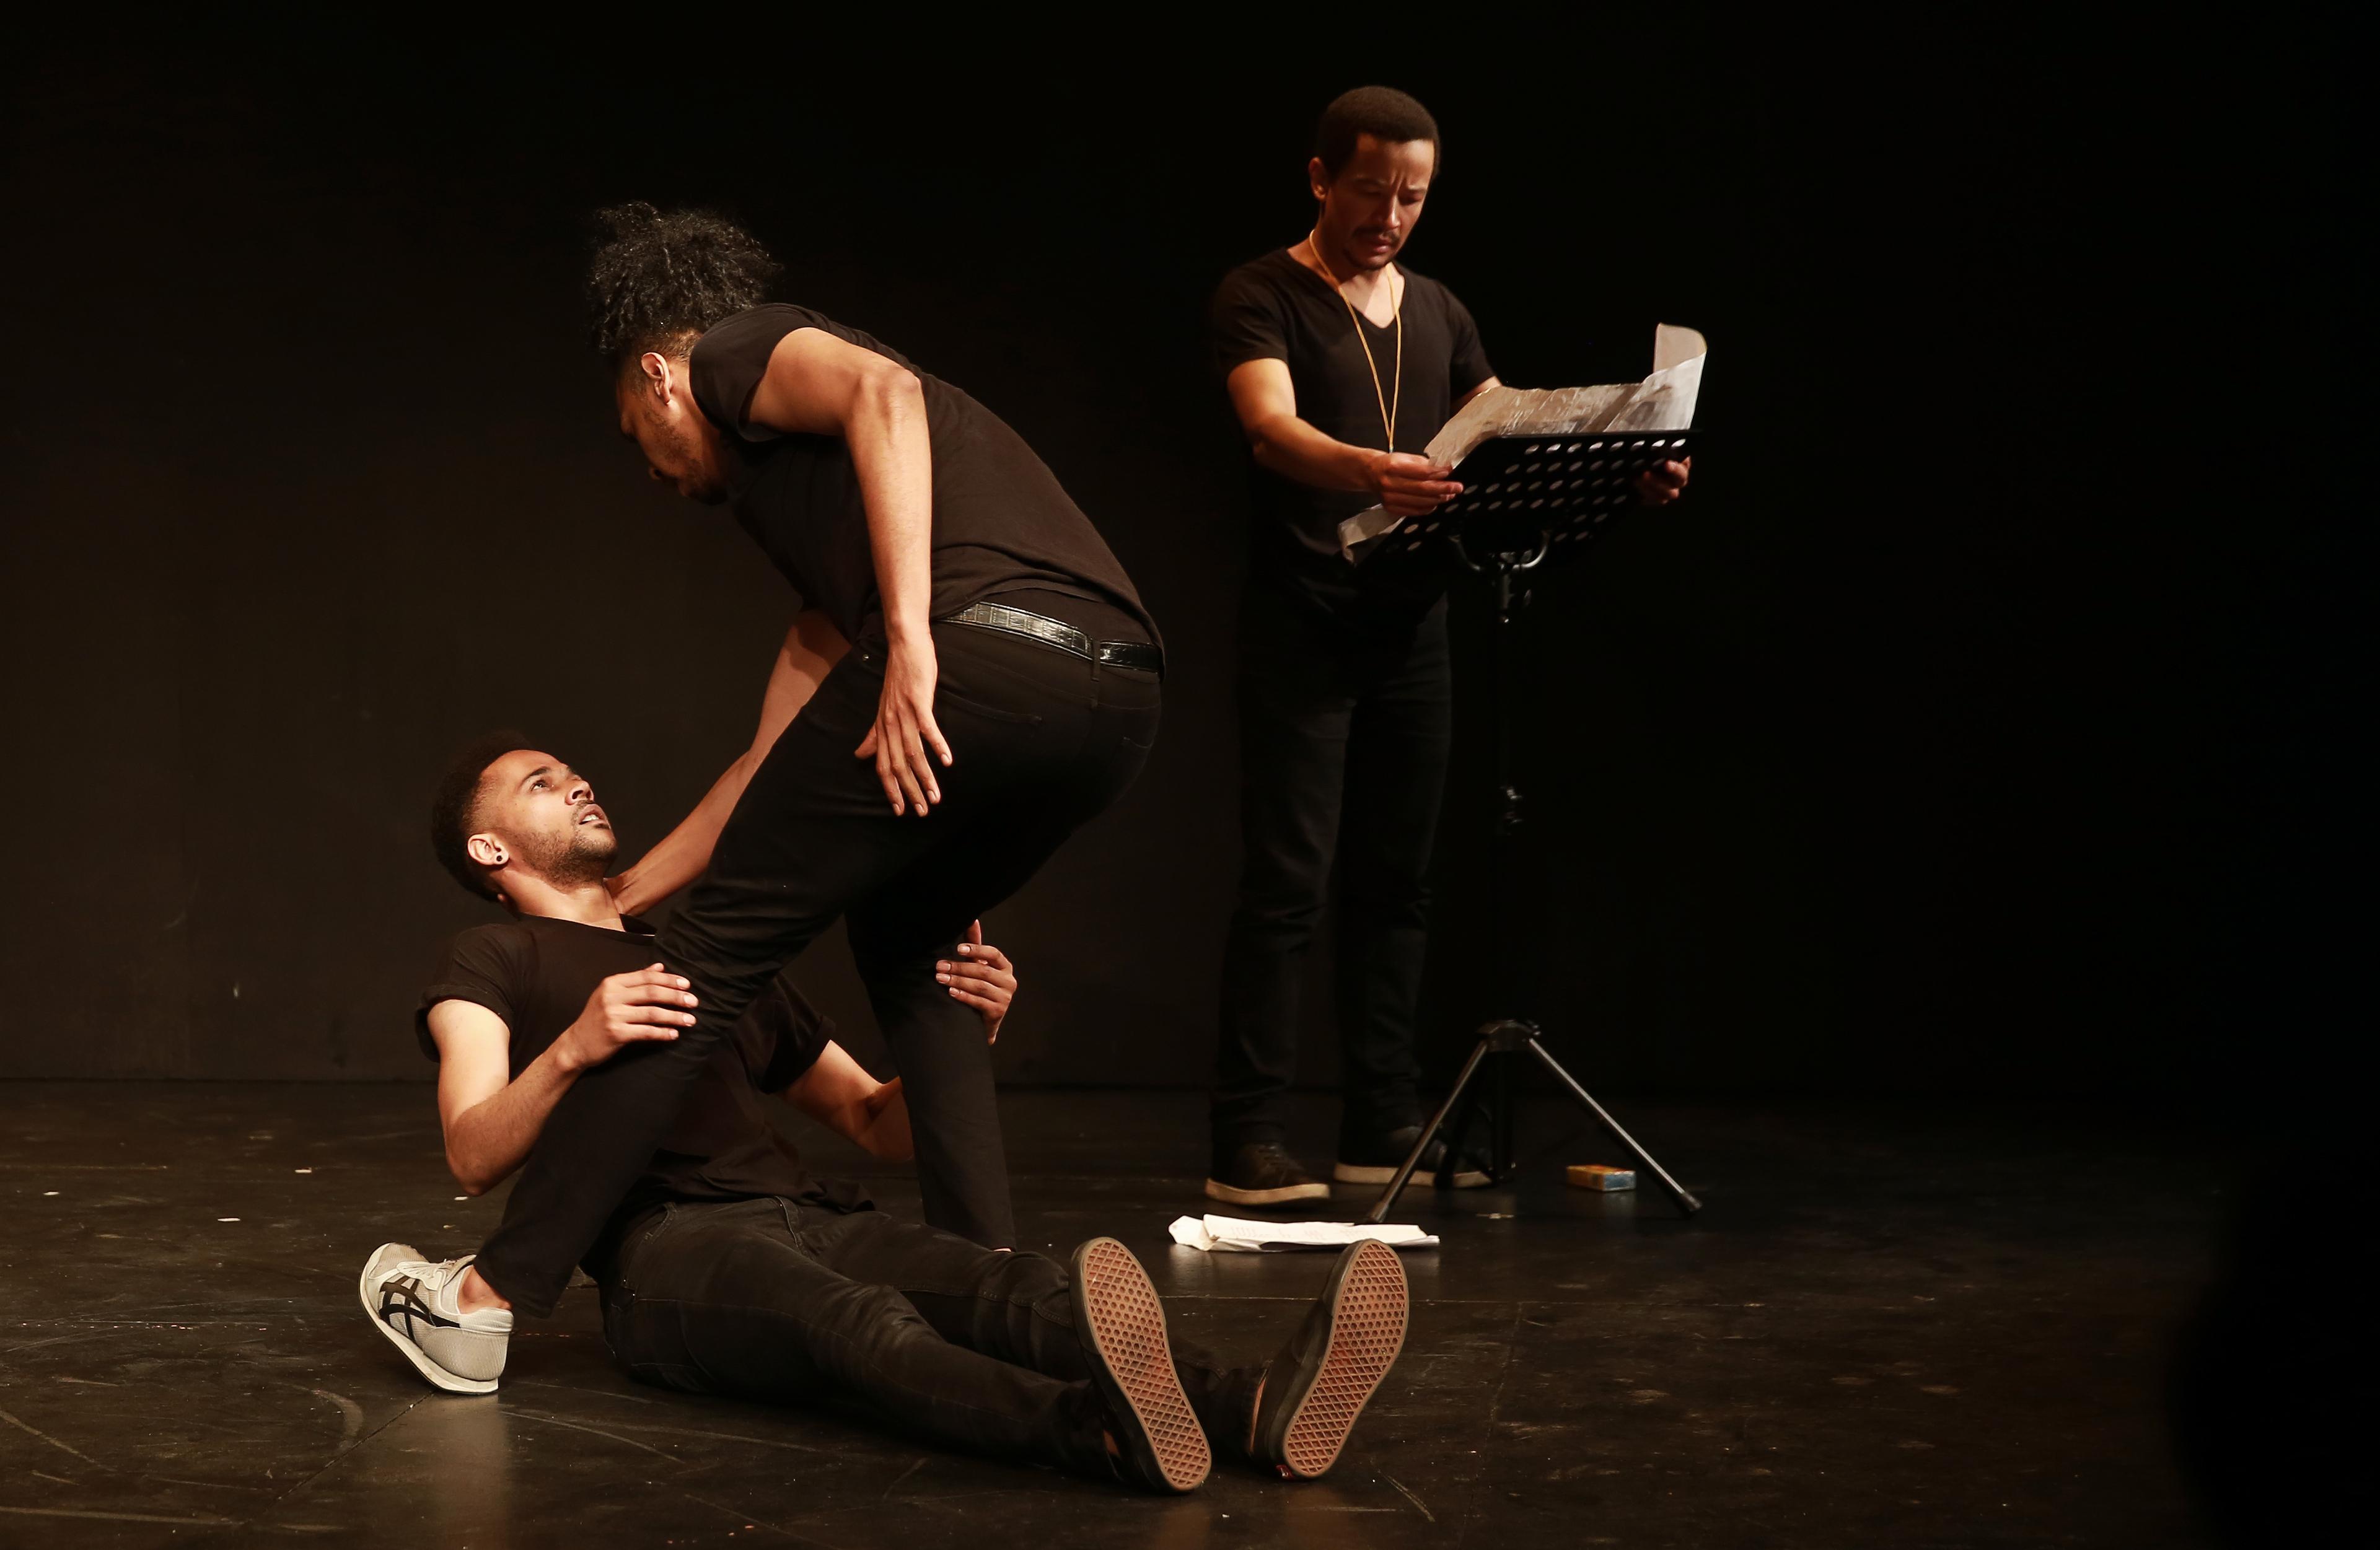 KKNK Karatara Shaun Oelf (sitting), Grant van Ster (looming) and Dean Balie as narrator